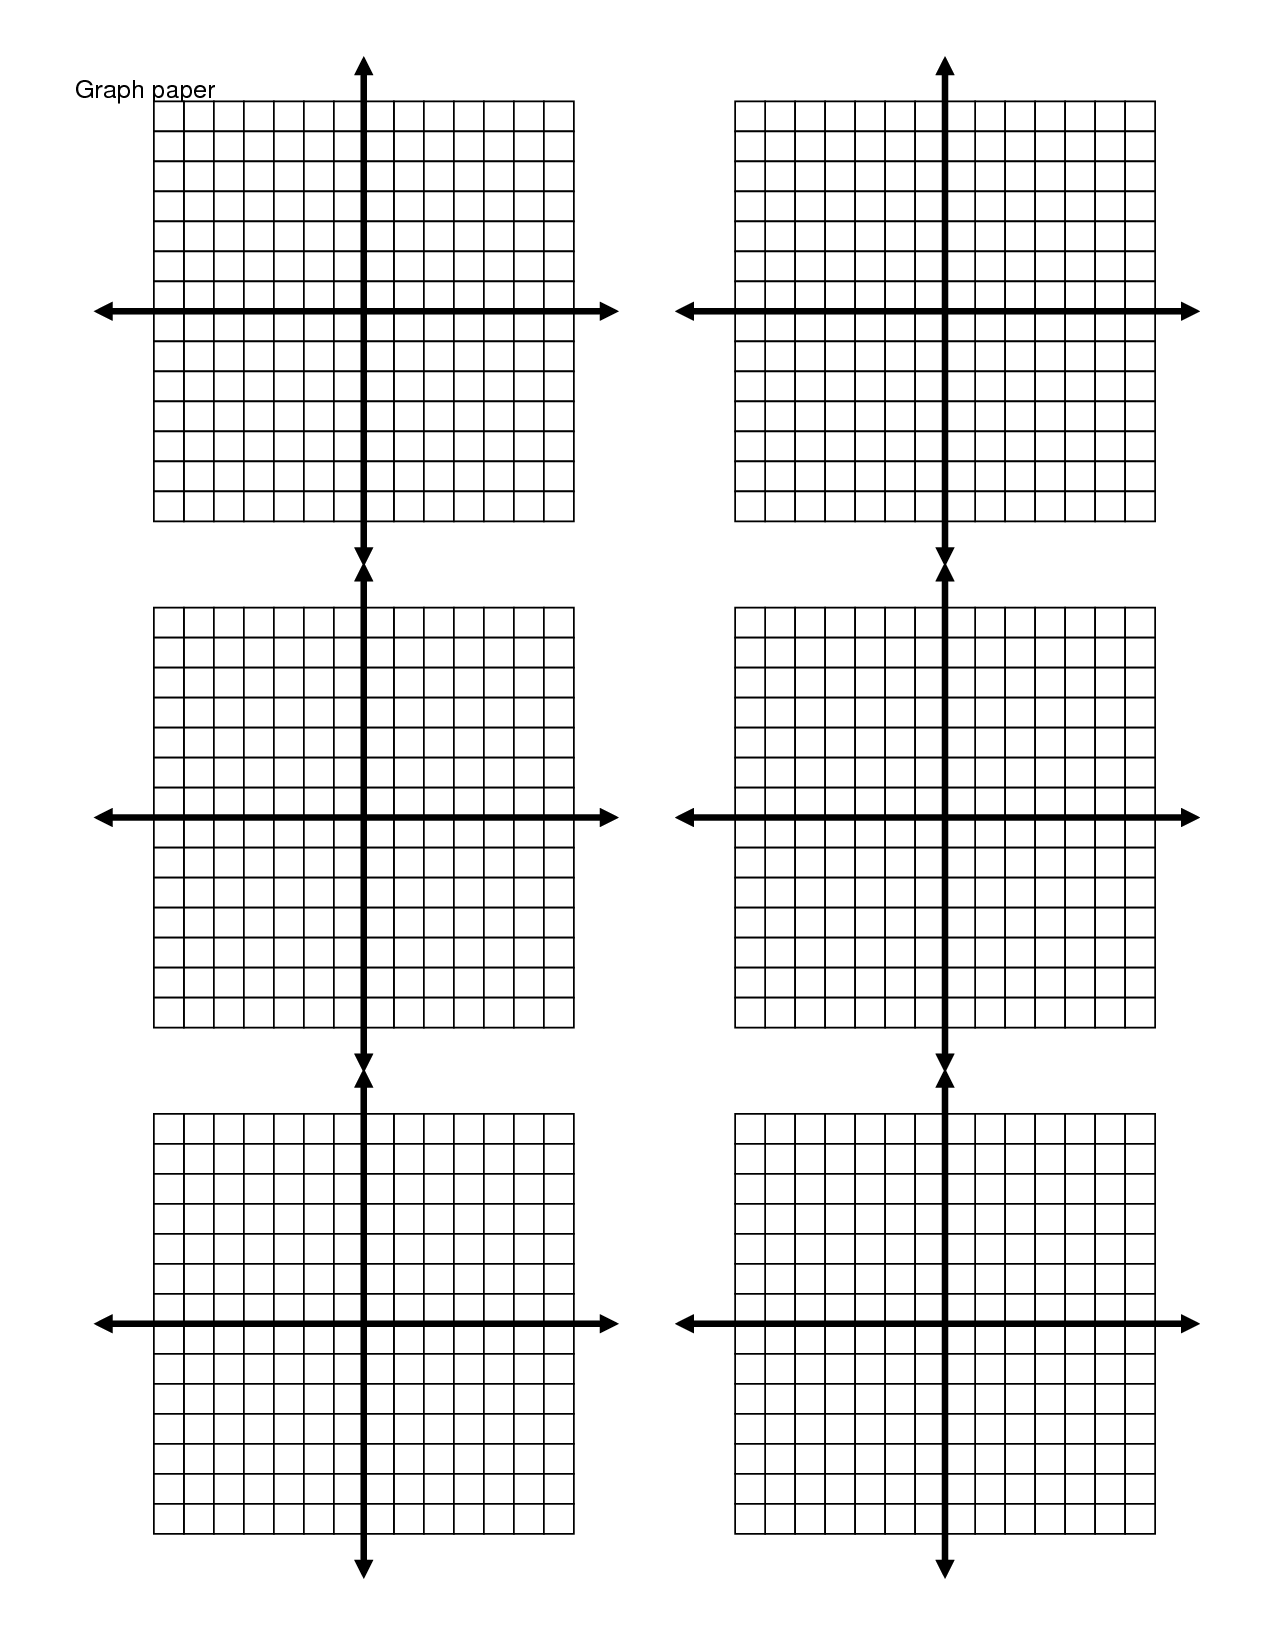 templates 6 per page bqTOtanu | Coordinate plane graphing ...